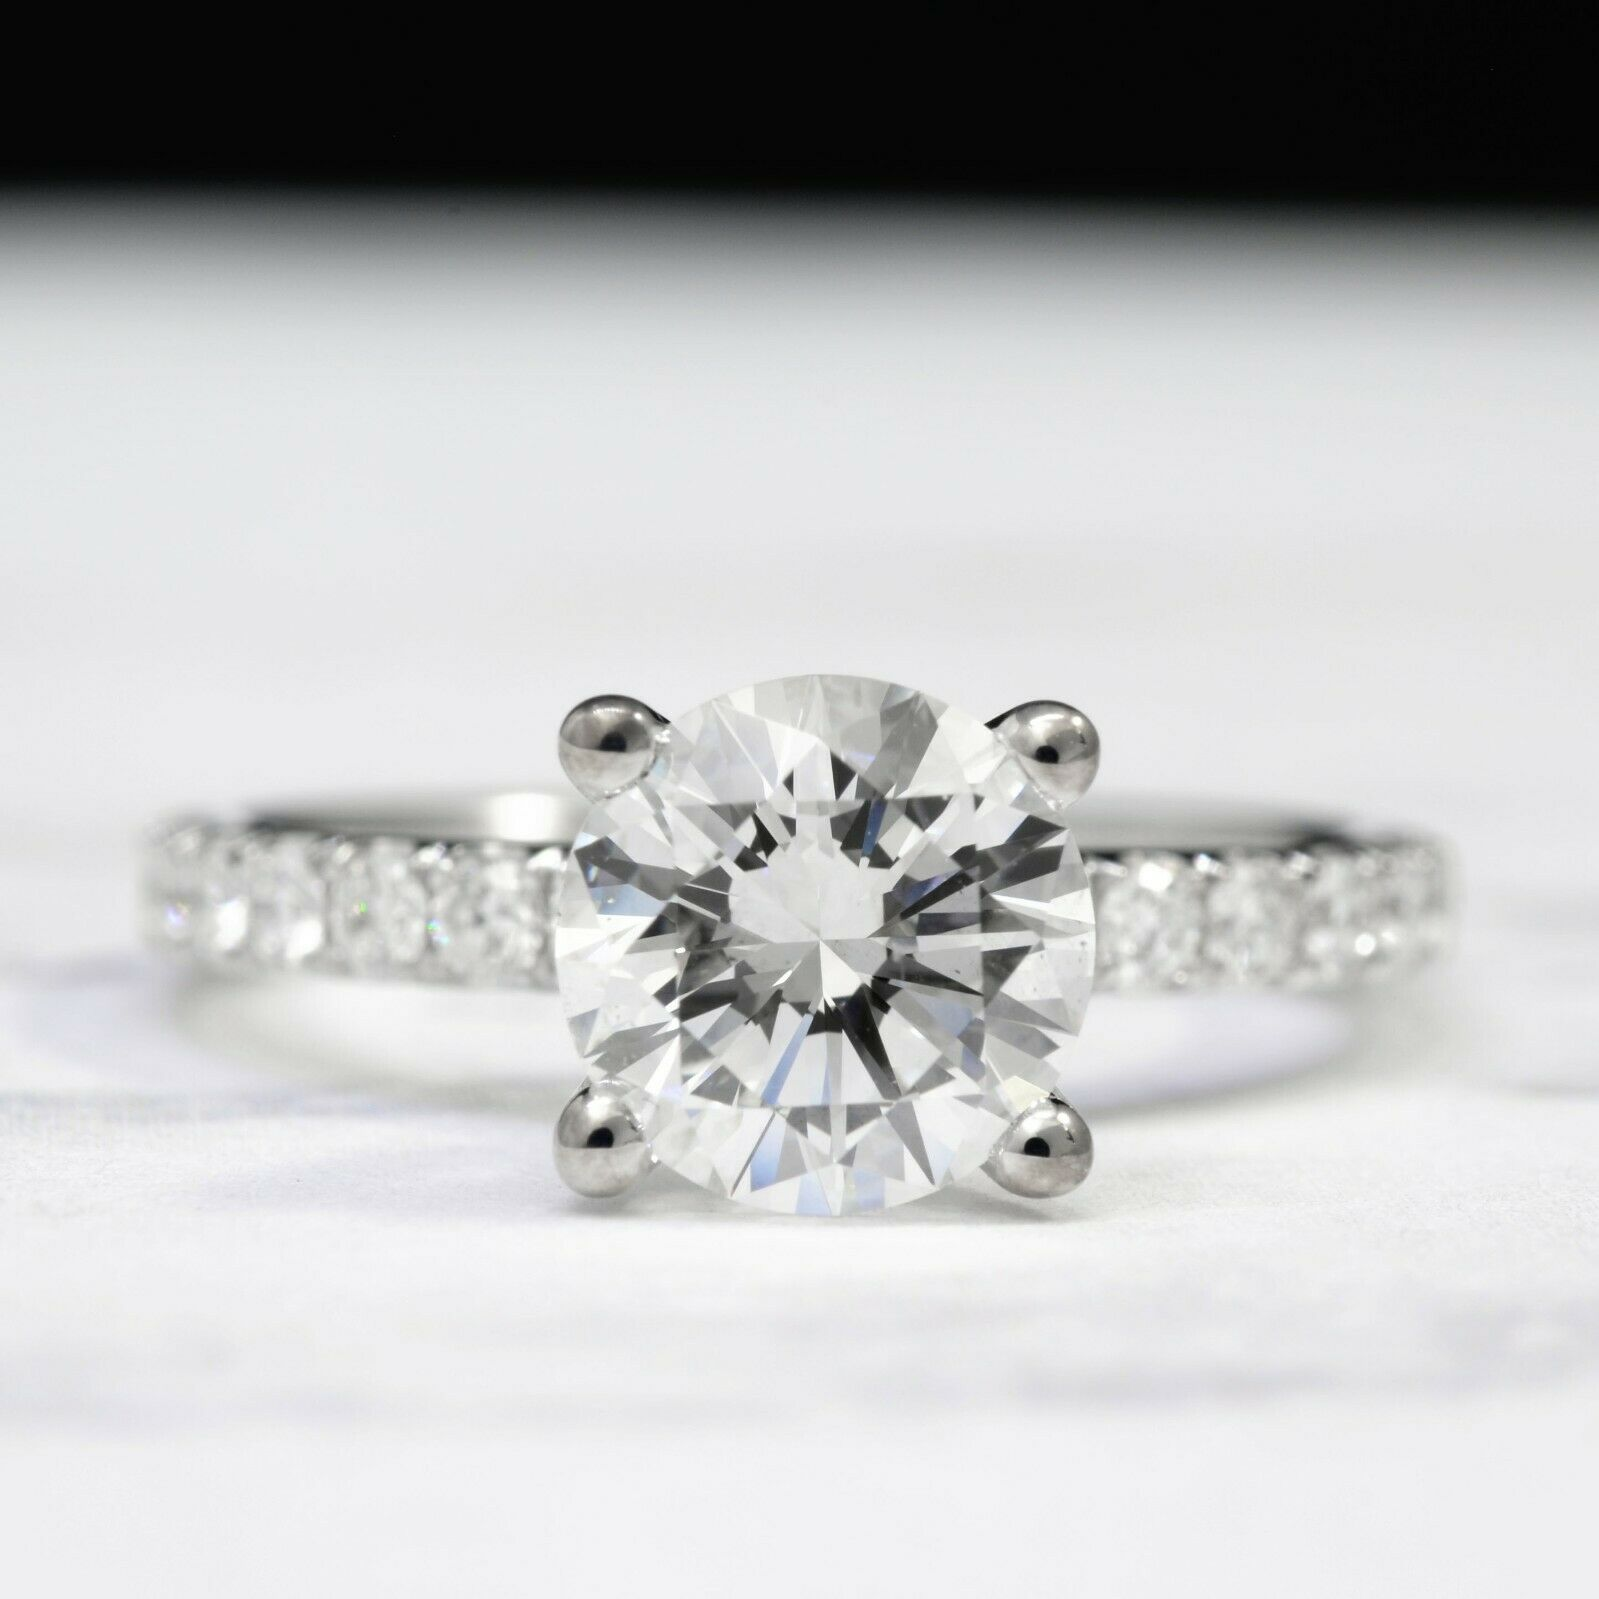 1.57 TCW Natural Round Cut U-Pave Diamond Engagement Ring - G-SI1 Triple X GIA  3